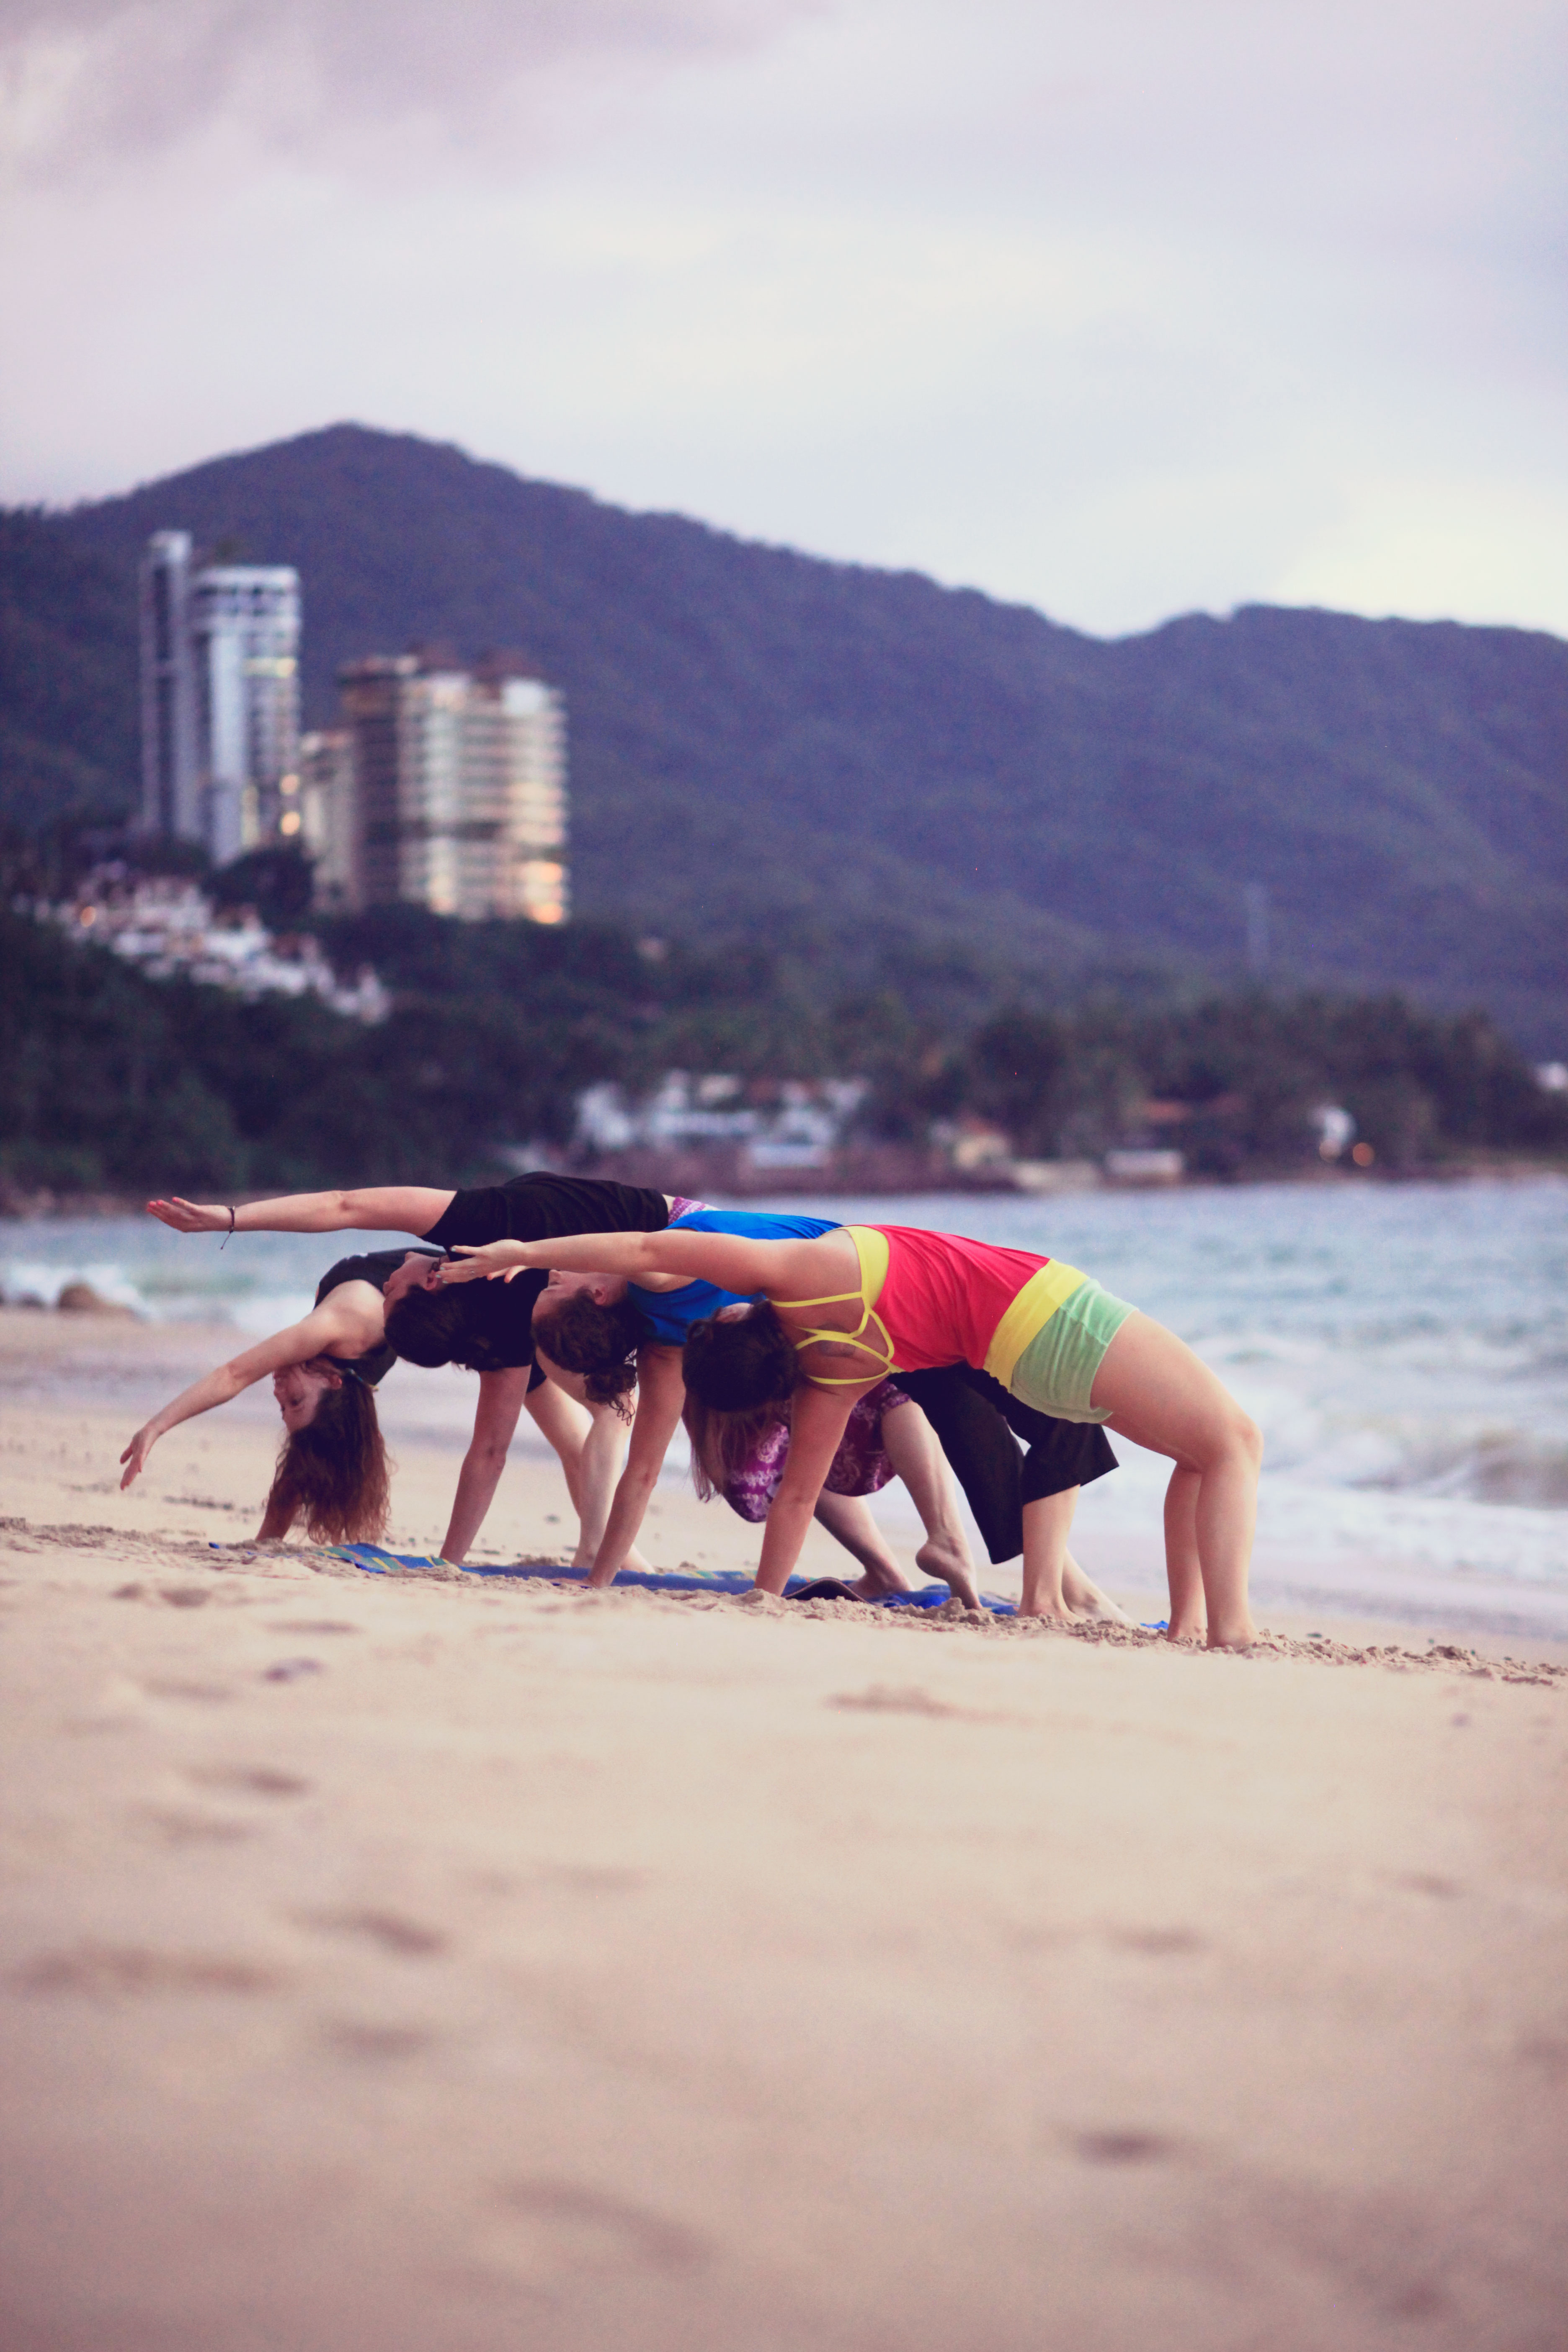 Beach + Yoga = Happiness